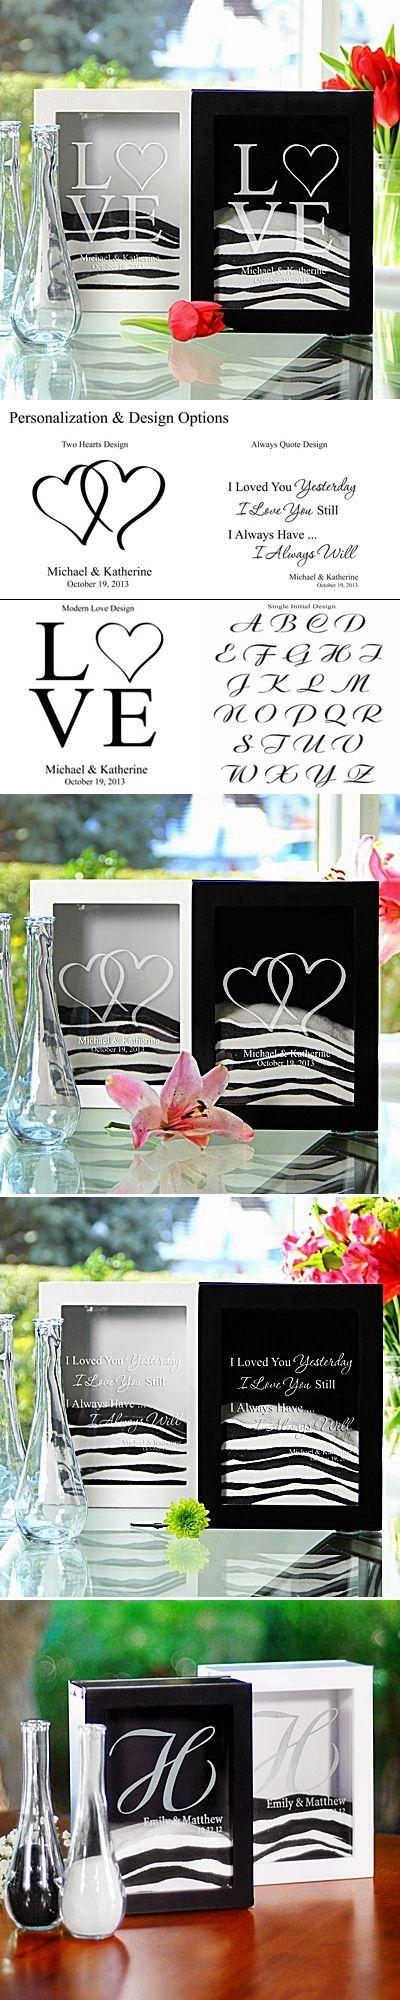 Personalized Sand Unity Ceremony Shadow Box Set (4 Designs)